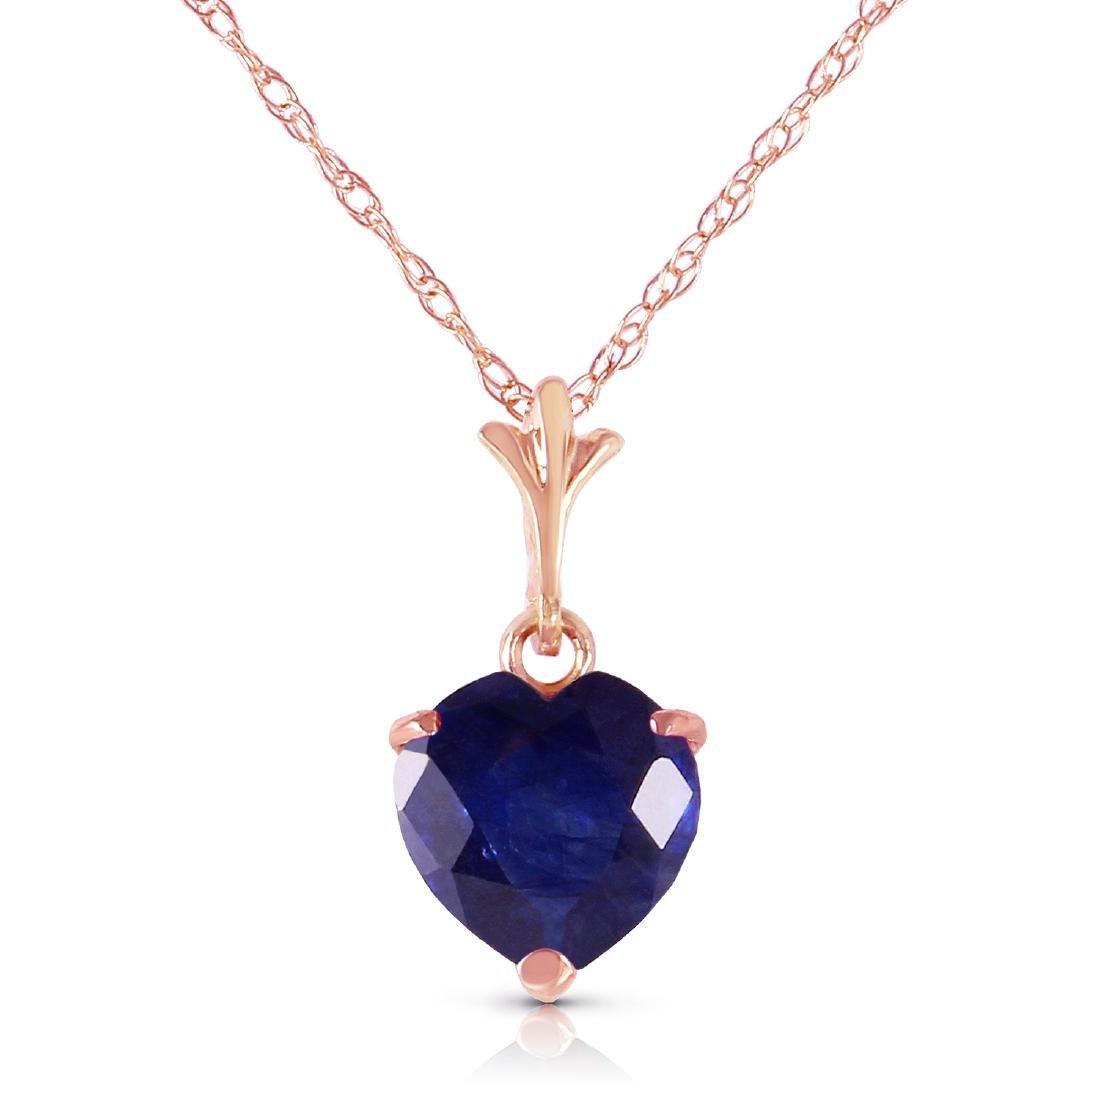 Genuine 1.55 ctw Sapphire Necklace Jewelry 14KT Rose